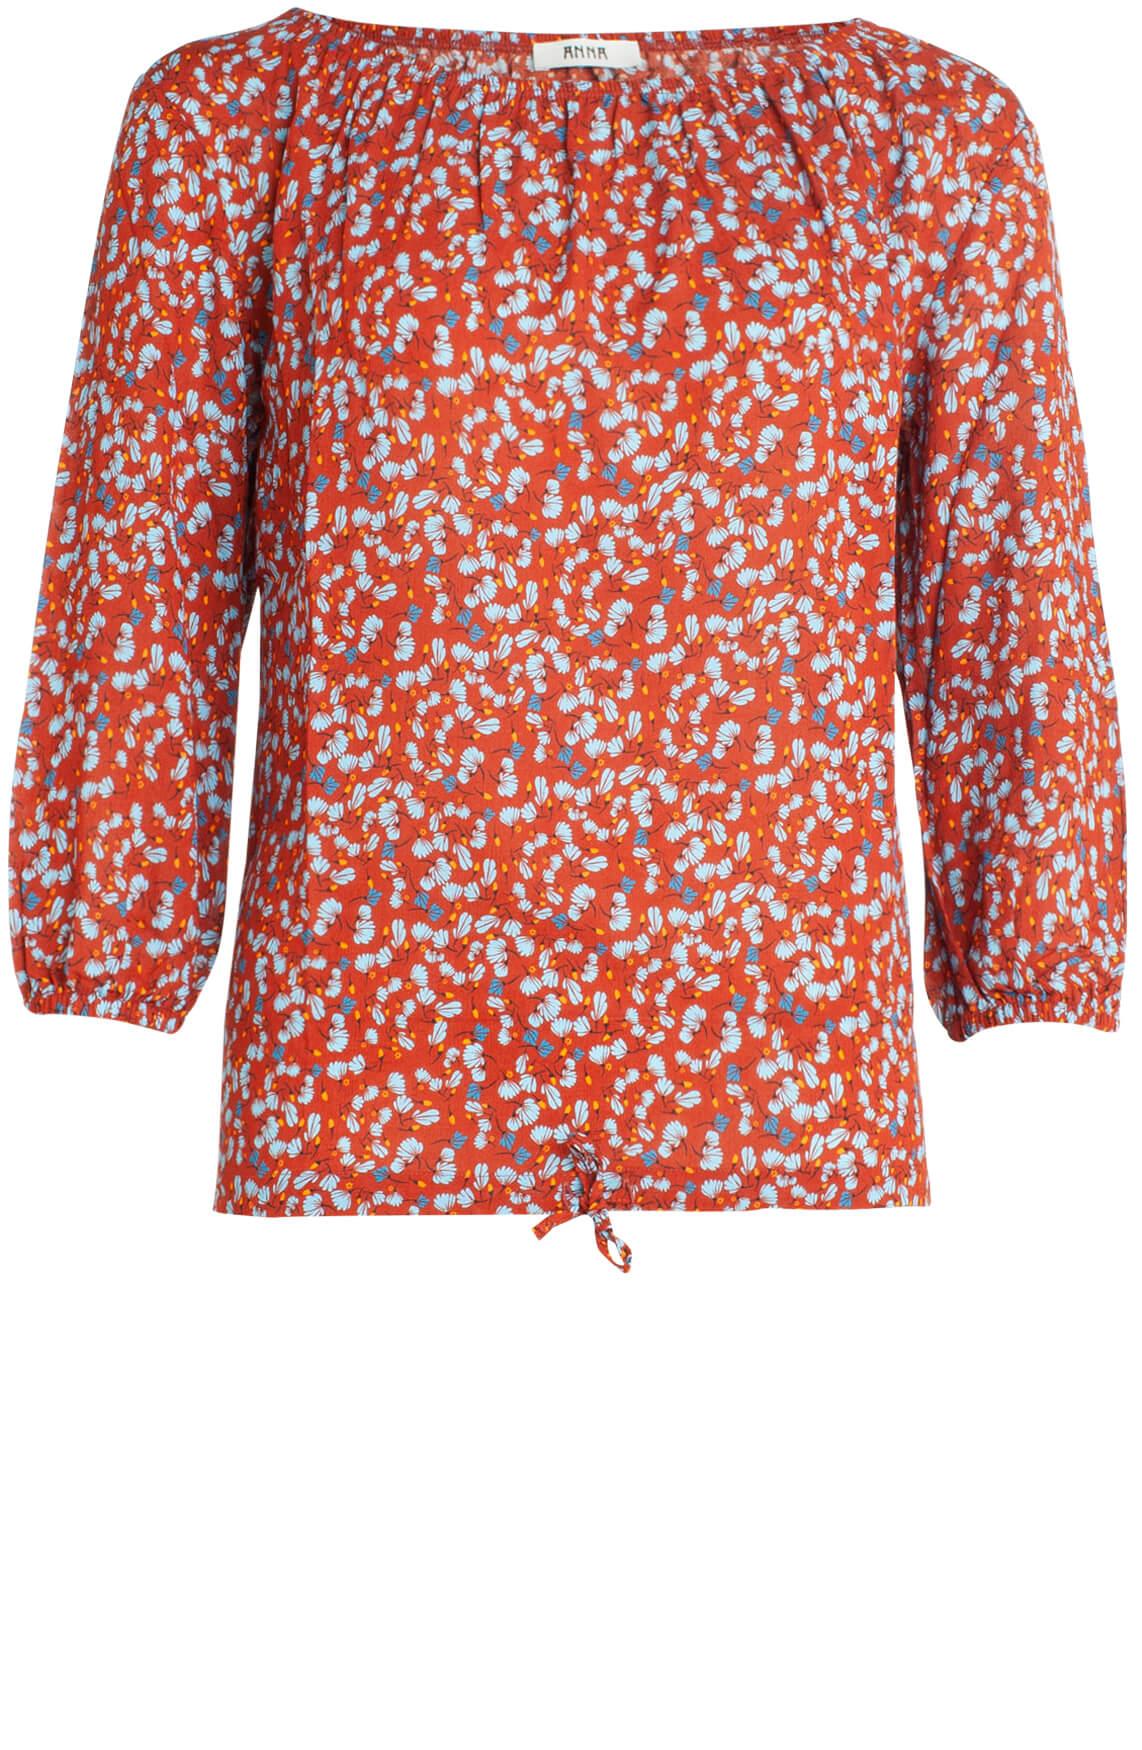 Anna Dames Blouse met floral print Rood